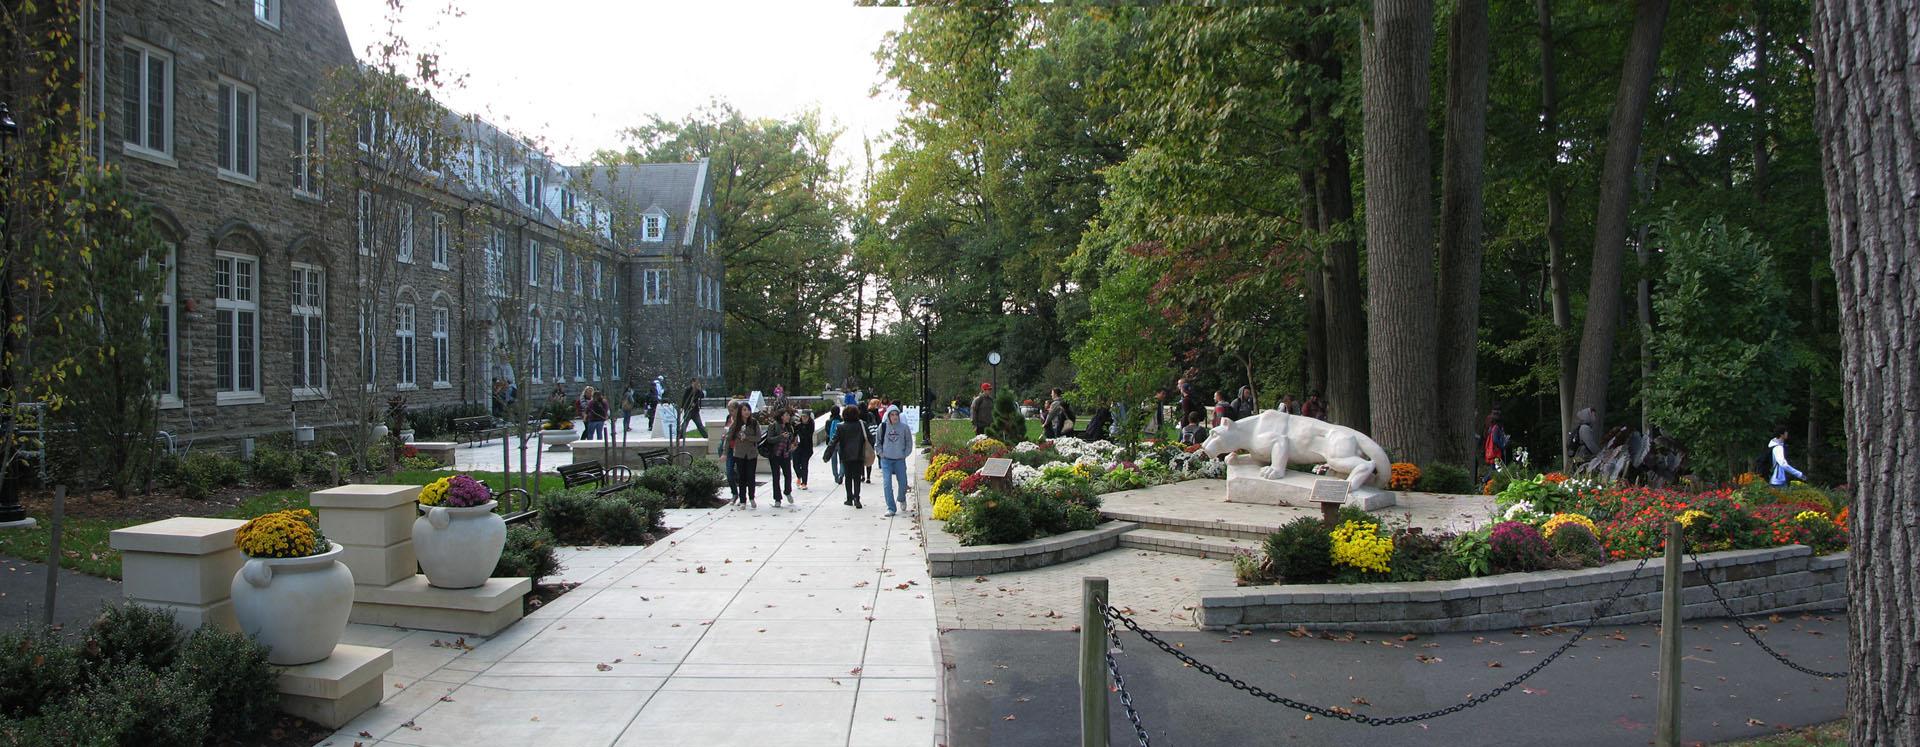 Penn State University Abington Campus Photo1